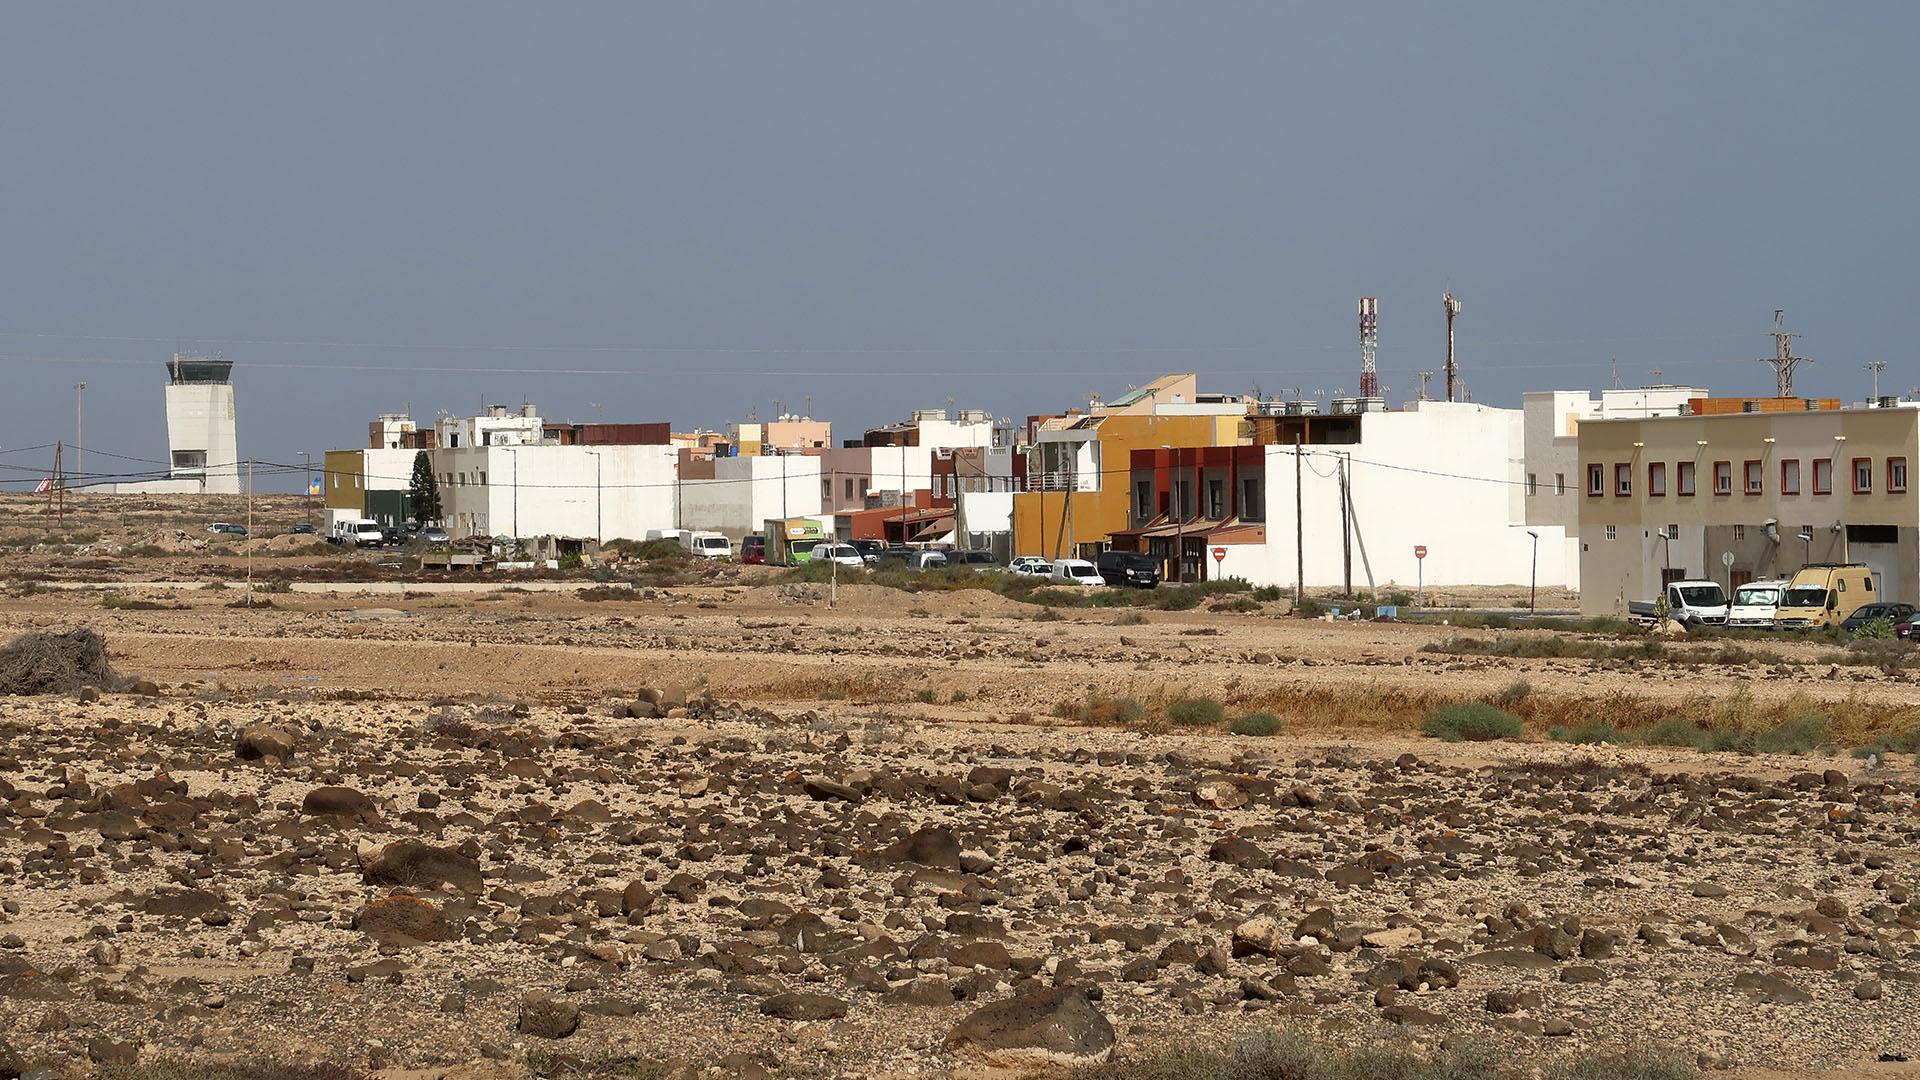 Der Ort El Matorral Fuerteventura.